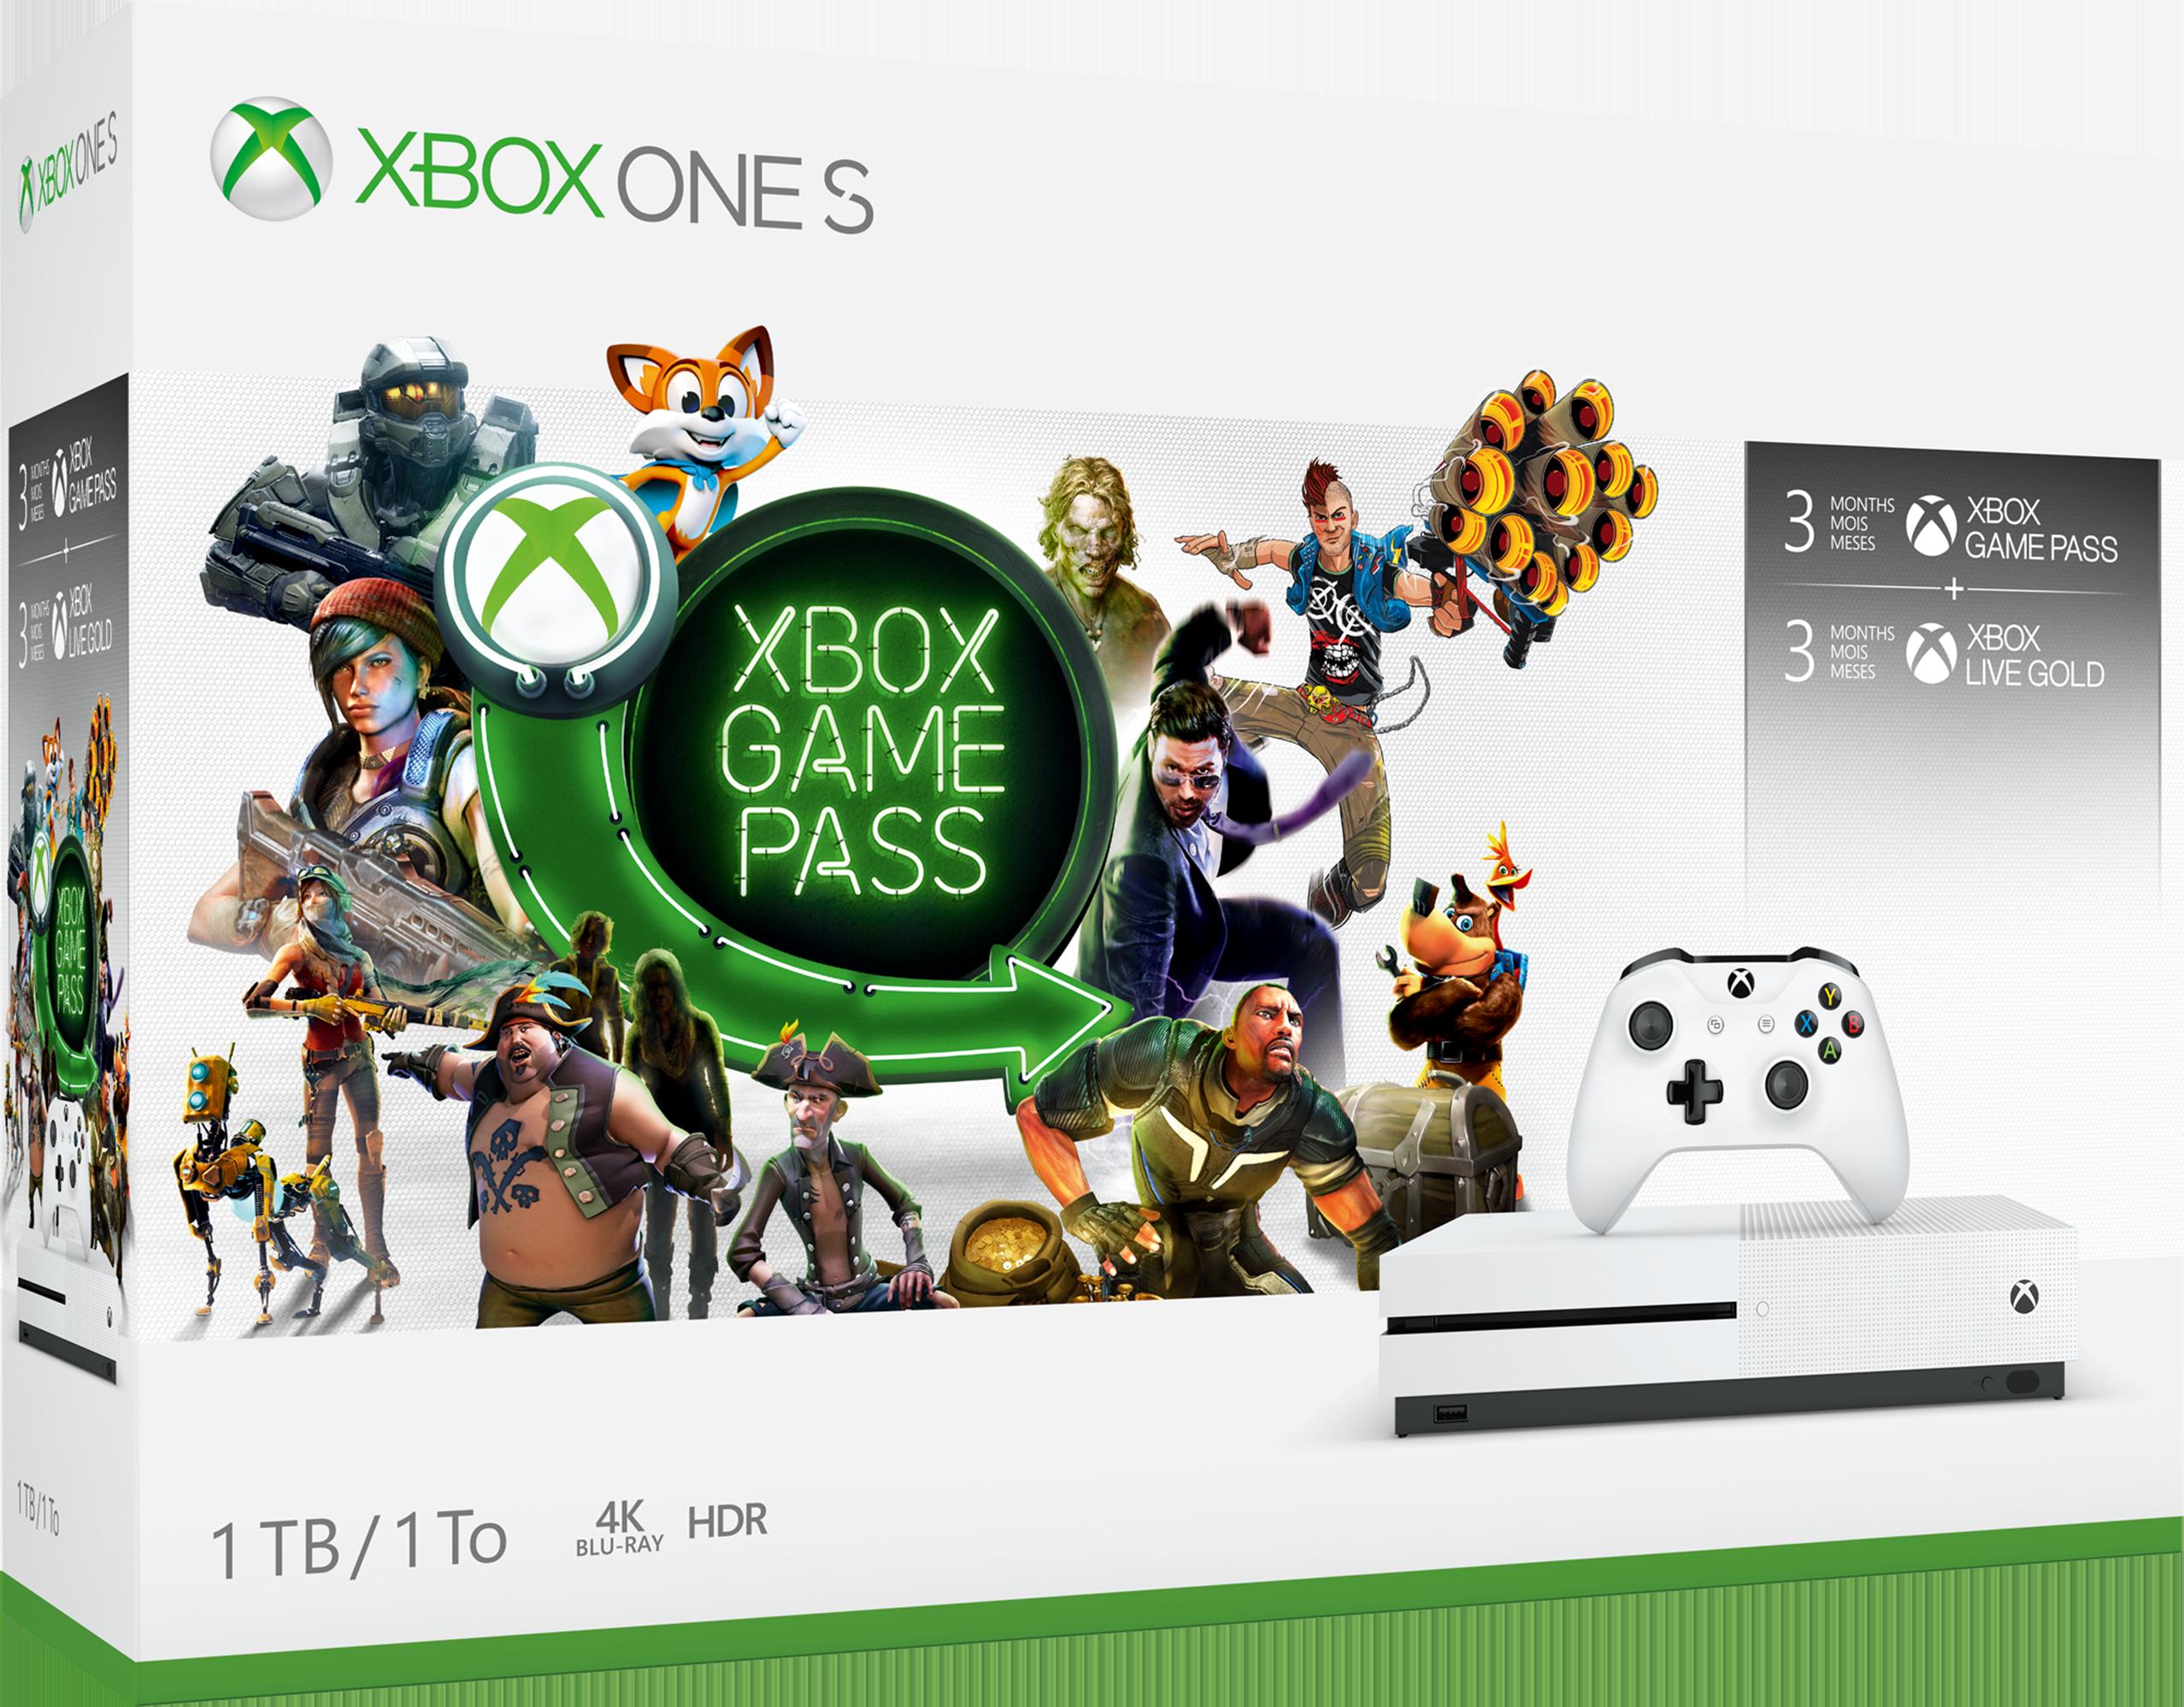 Xbox One S Starter bundle 1TB box art